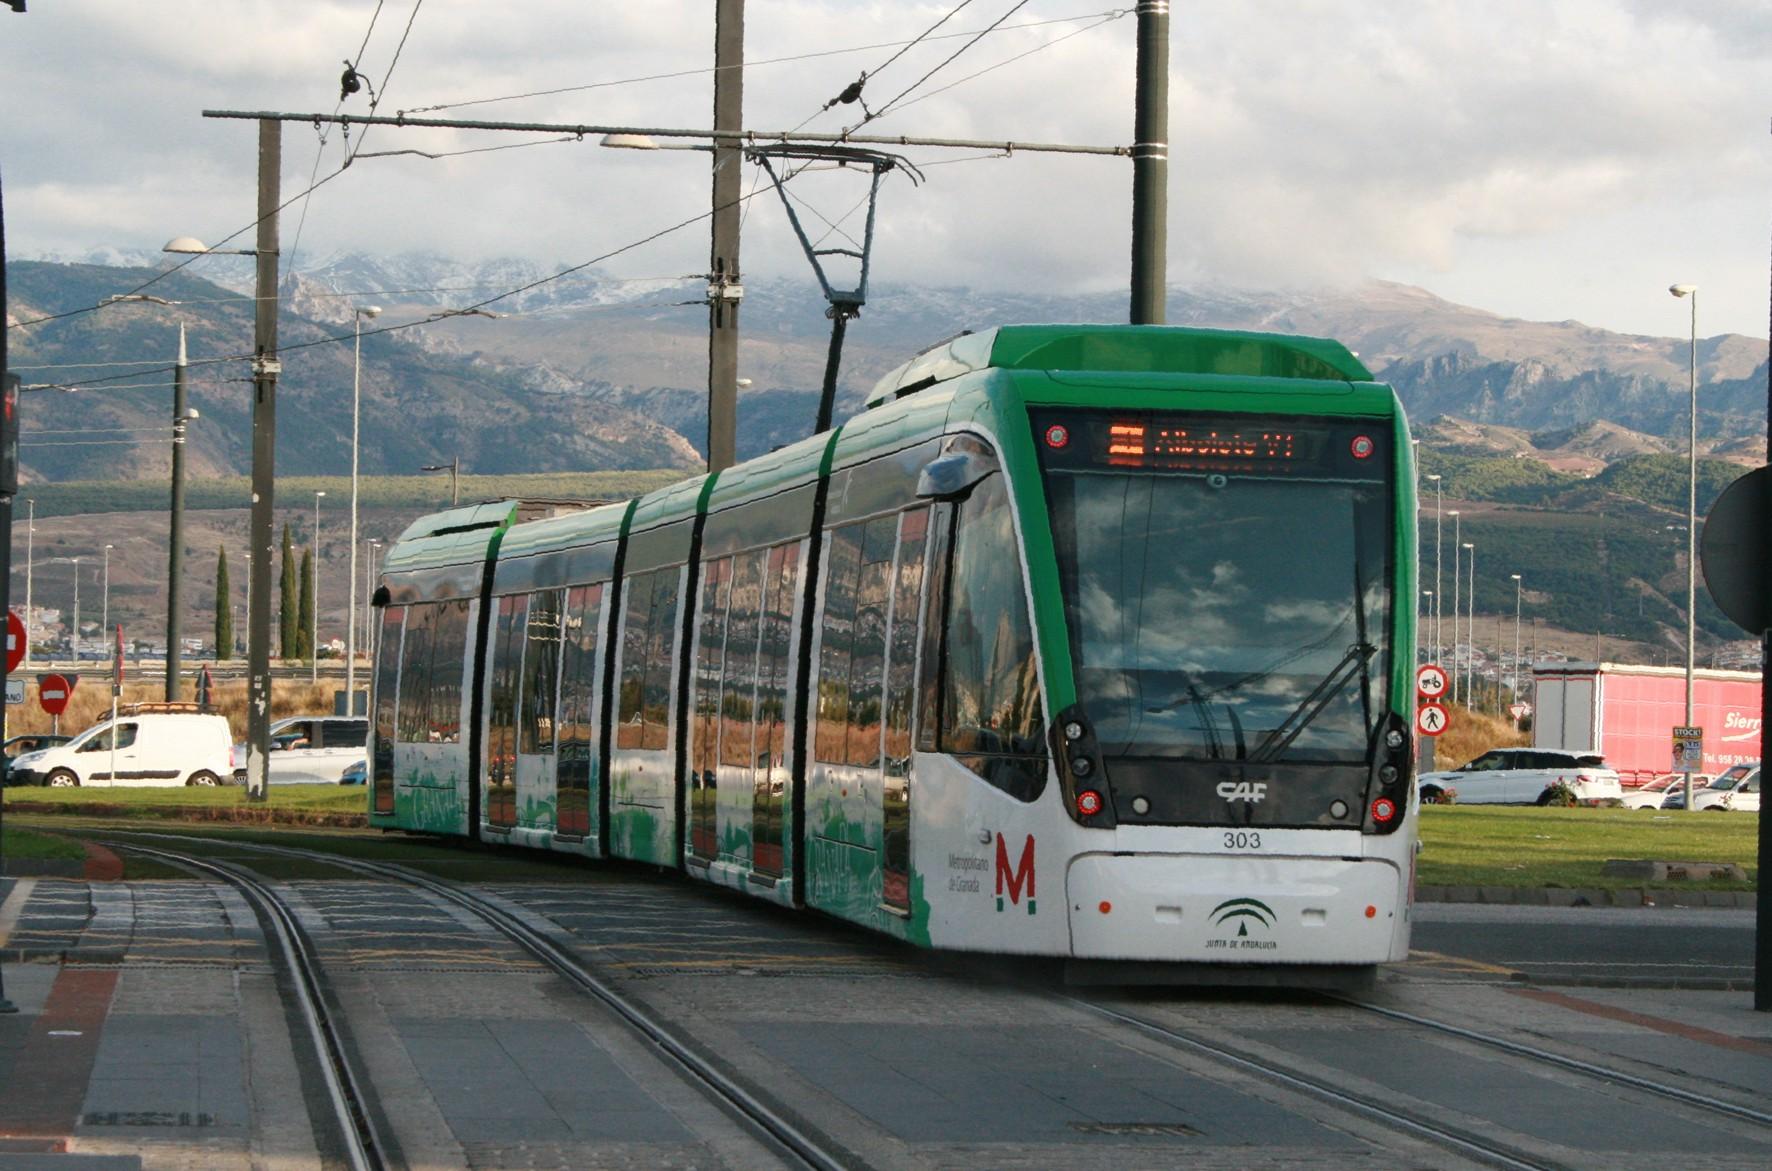 El Metro transportó a 5,9 millones de viajeros durante 2020 a pesar de la pandemia